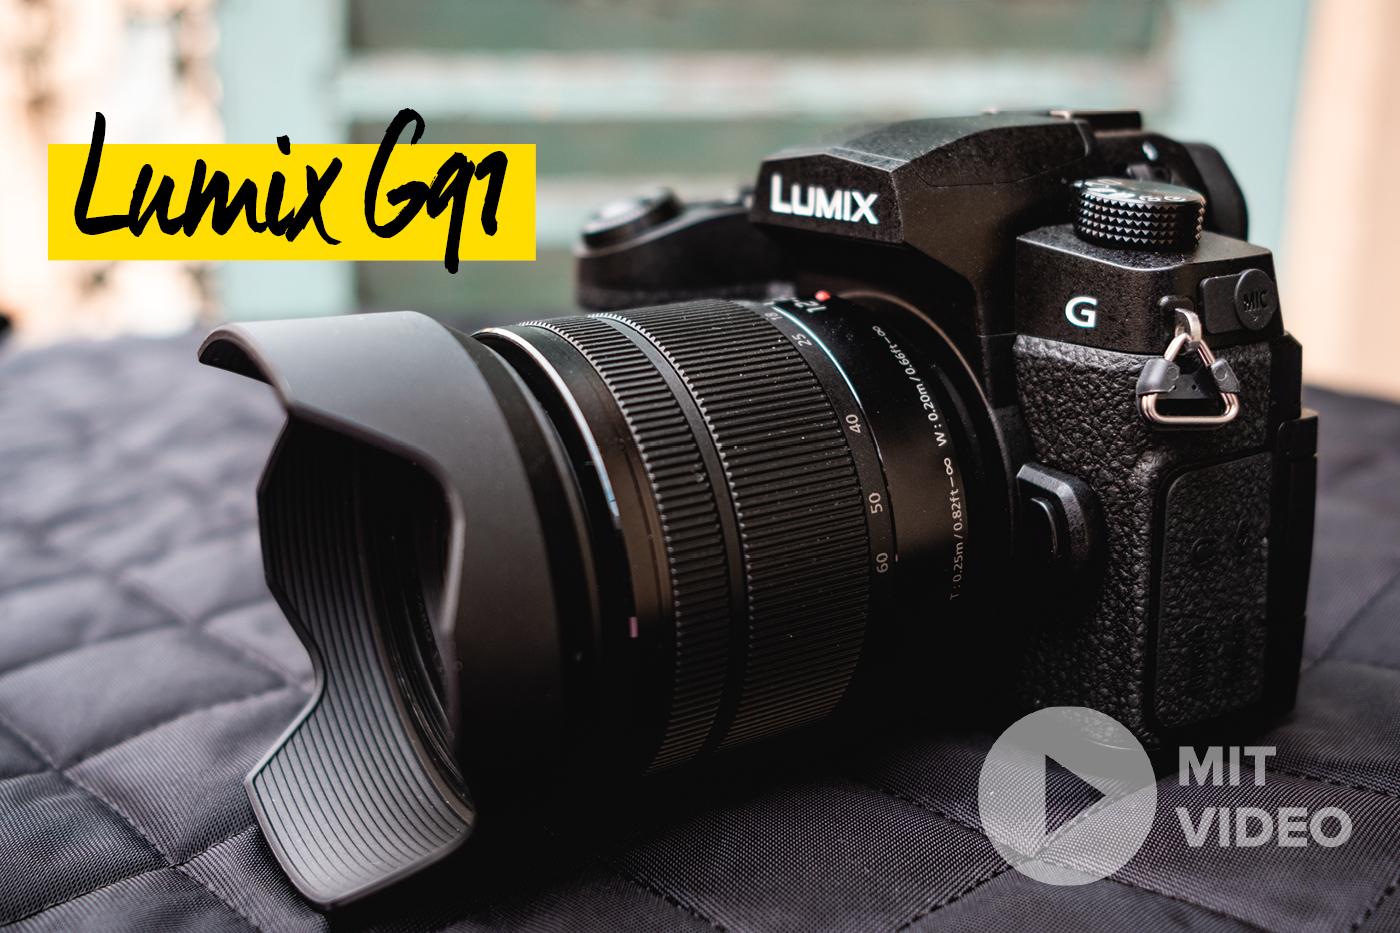 Lumix G91 u2013 Robuster Allrounder fu00fcr ambitionierte Fotografen